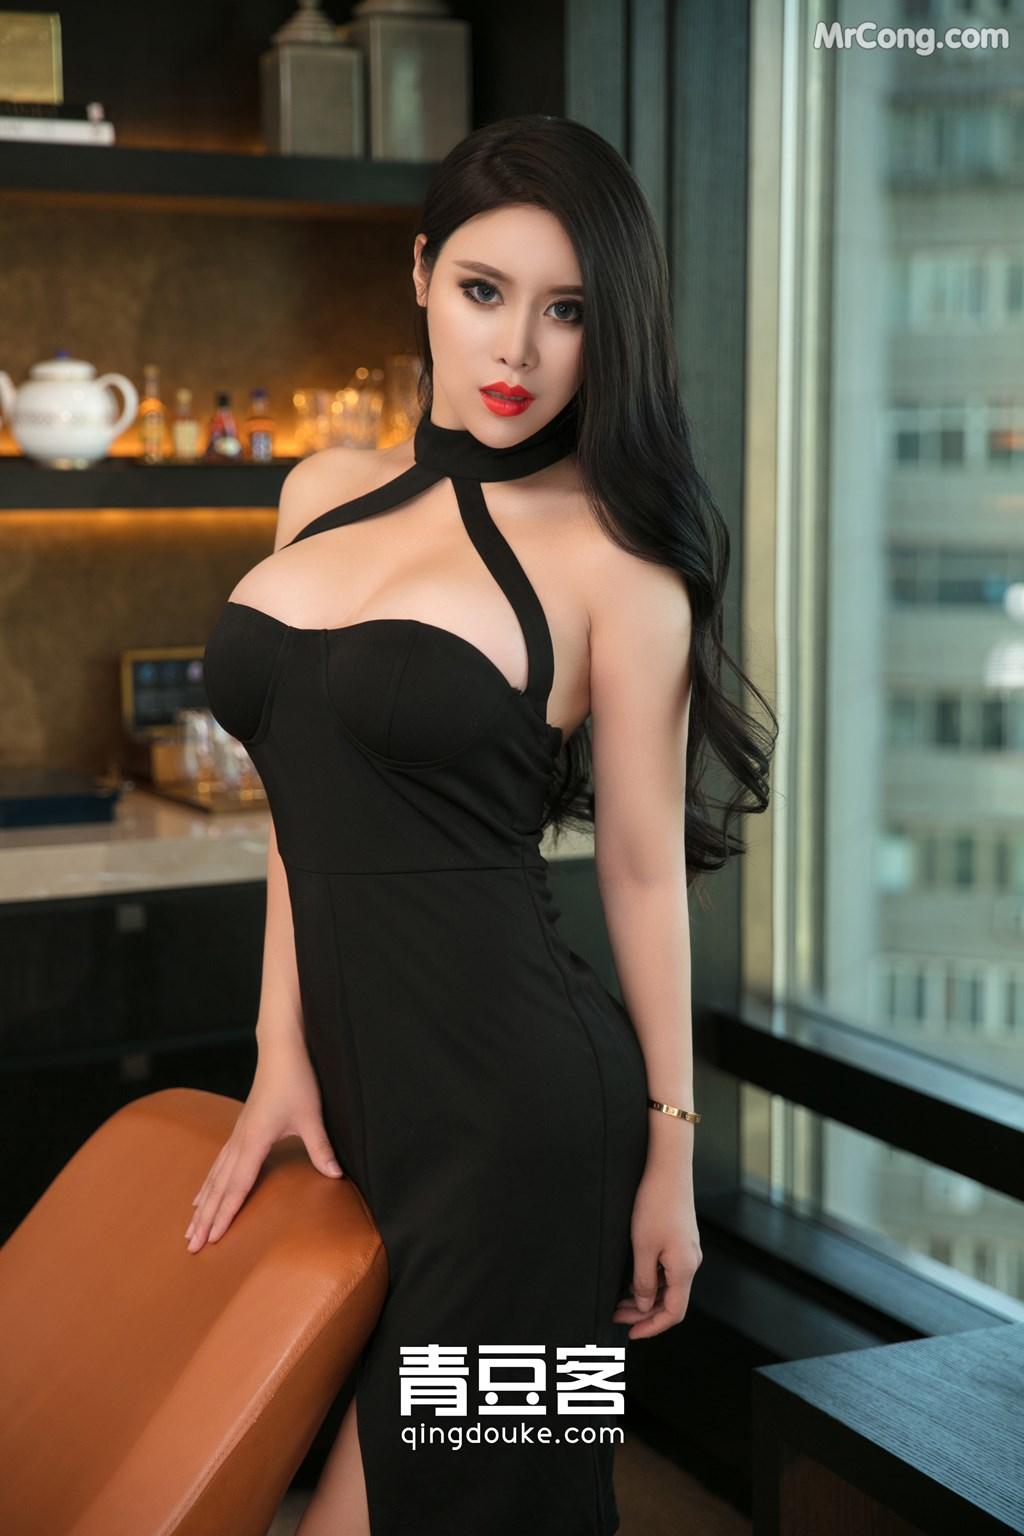 Image QingDouKe-2017-11-05-Ke-Rui-Na-MrCong.com-003 in post QingDouKe 2017-11-05: Người mẫu Ke Rui Na (可蕊娜) (48 ảnh)